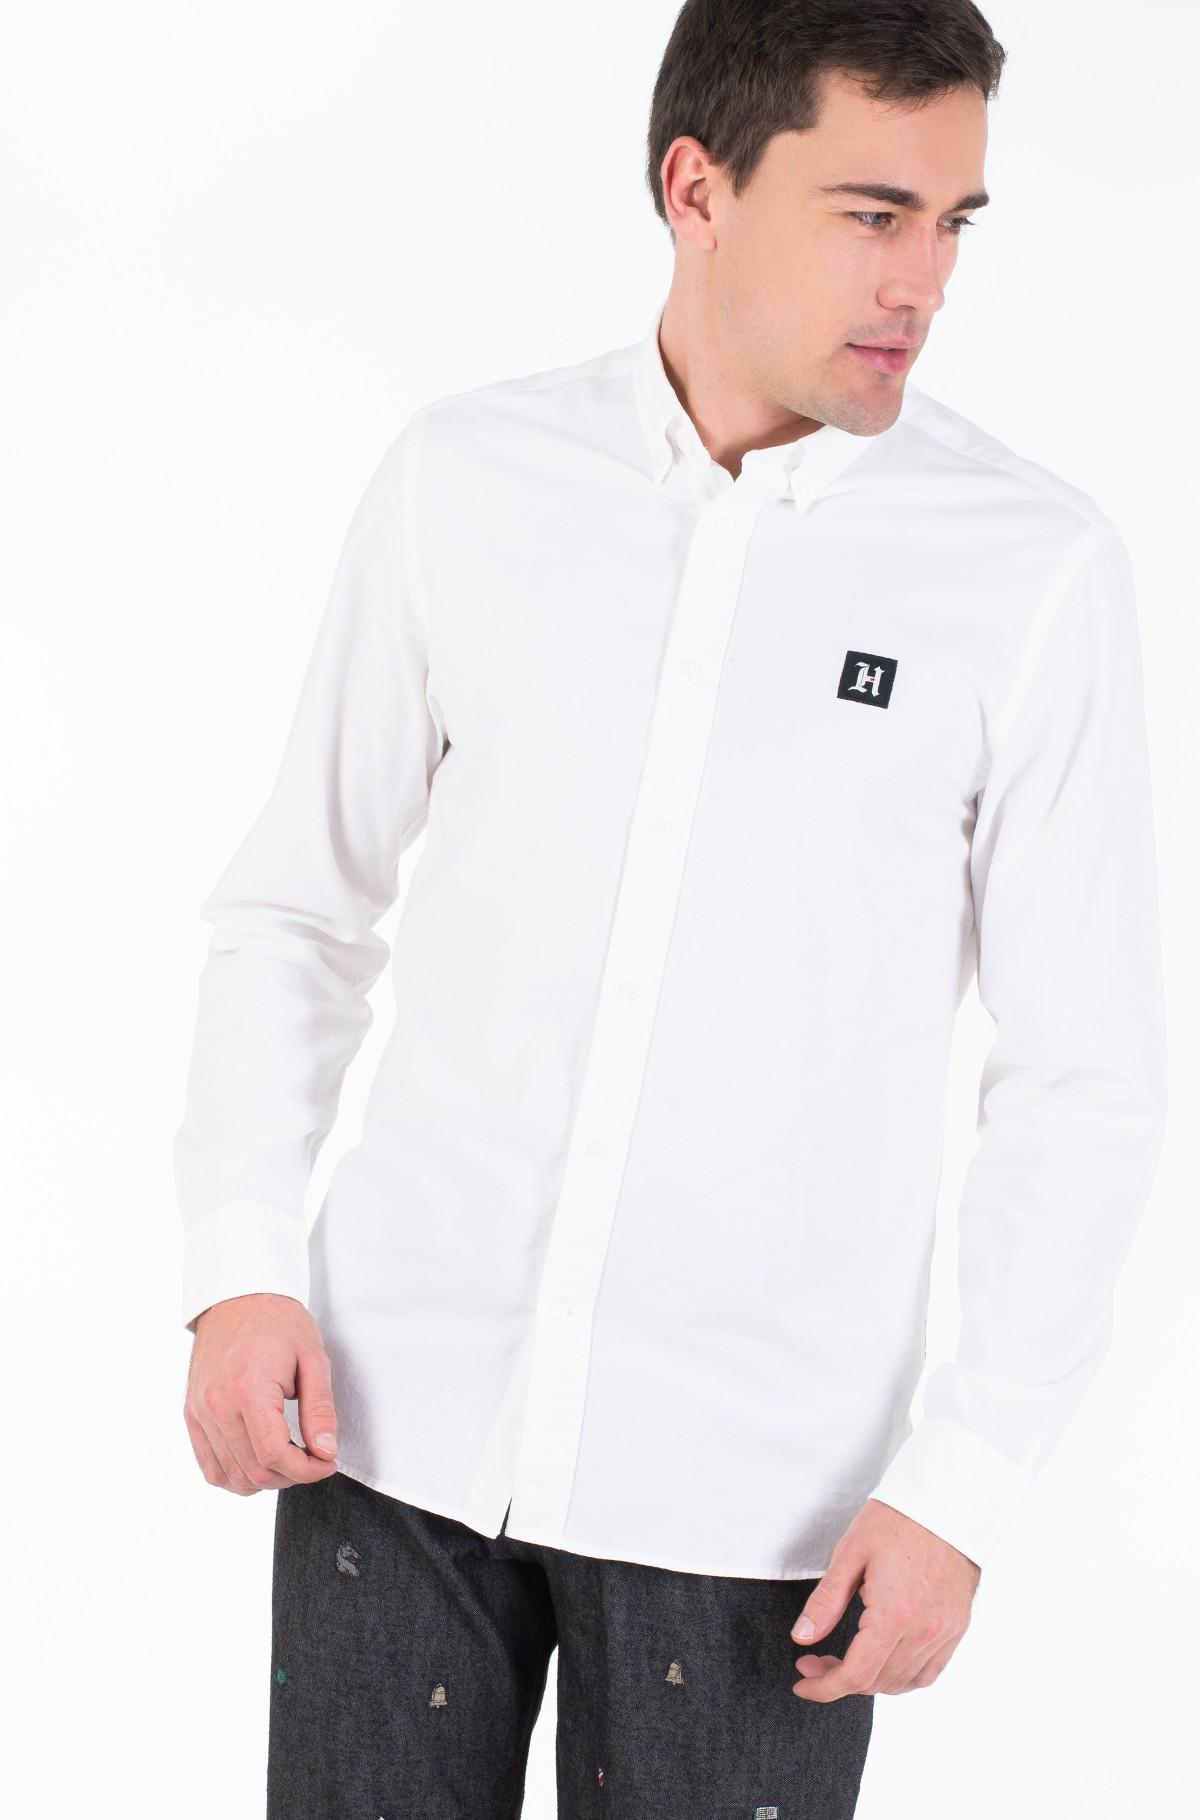 Marškiniai LH CLASSIC OXFORD SHIRT-full-1